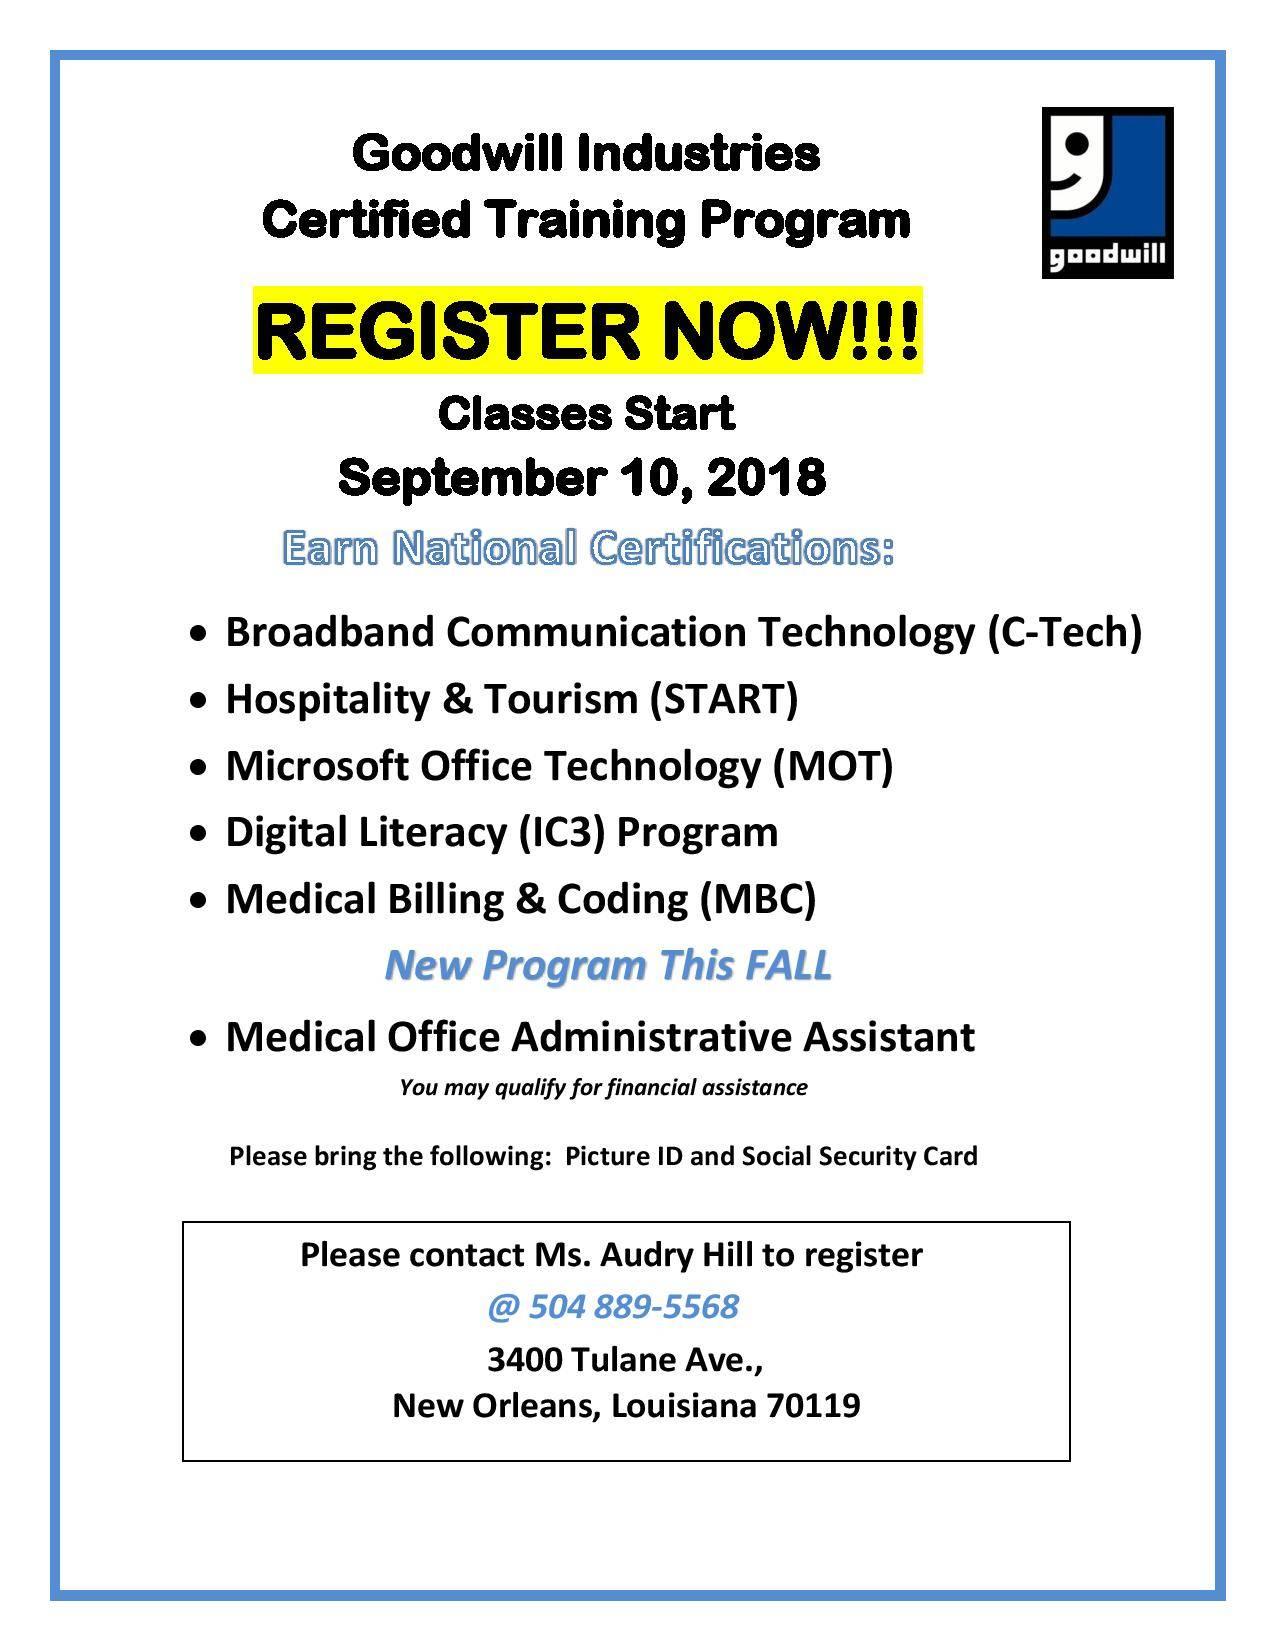 Registration Now Open For Goodwills Certified Training Program